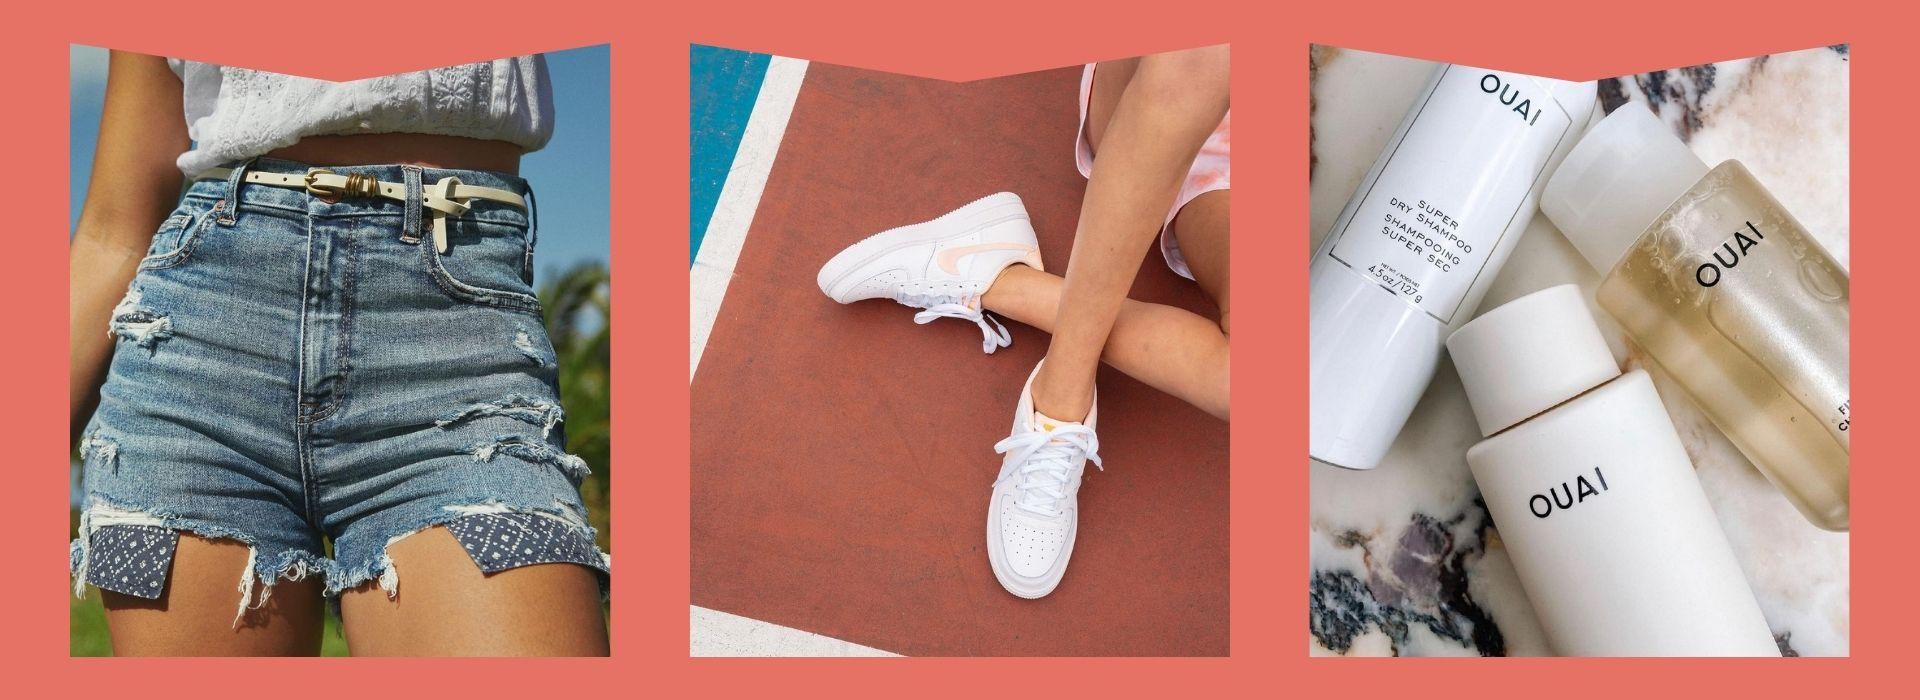 Denim shorts, sneakers, dry shampoo